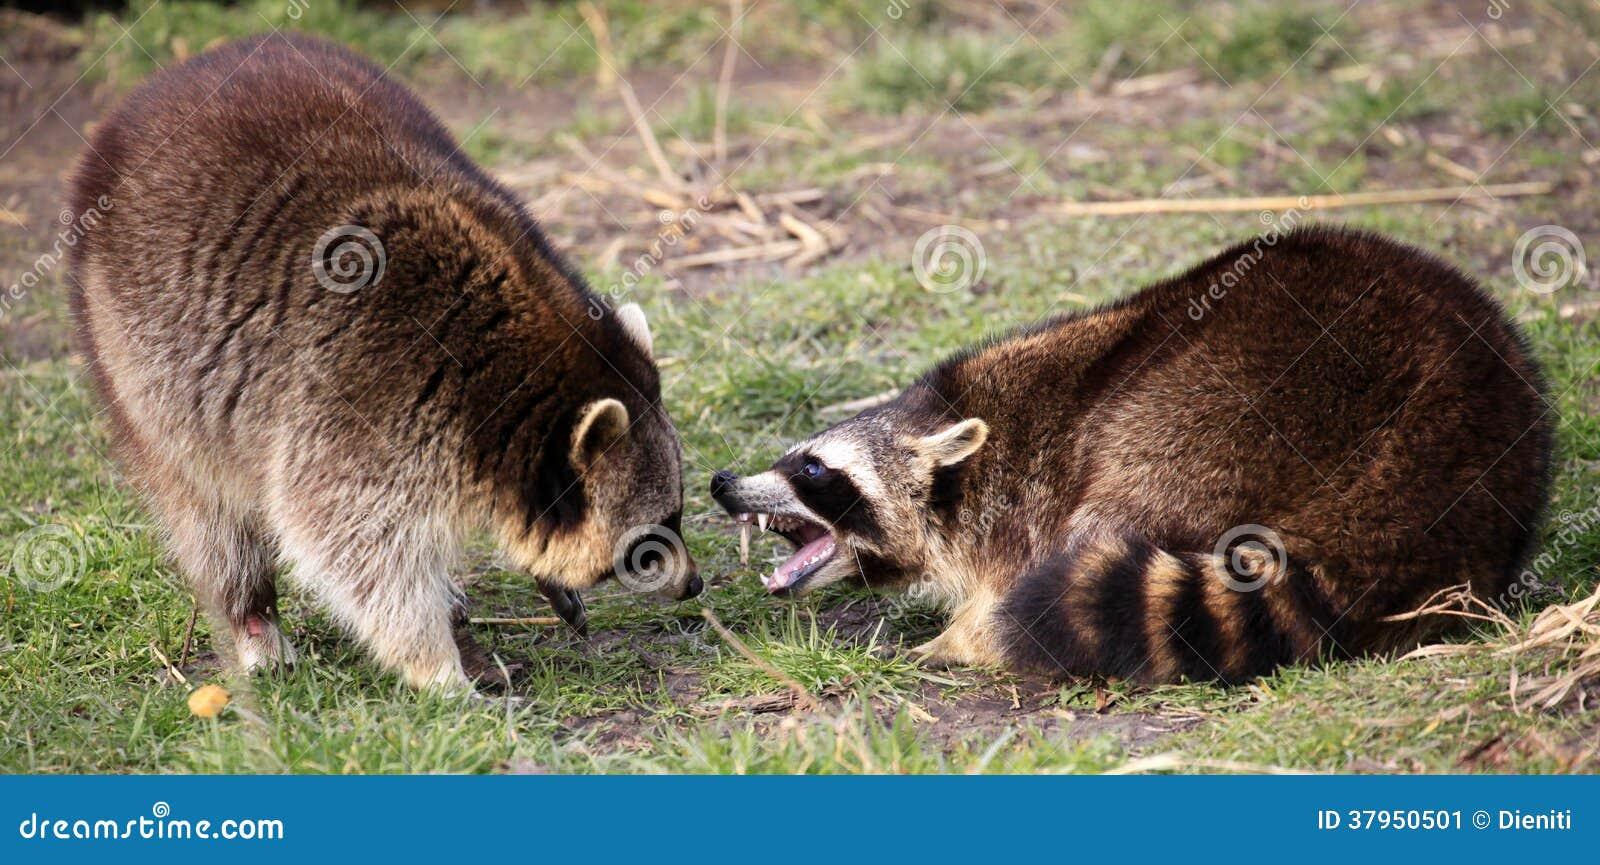 how to kill racoon ontario